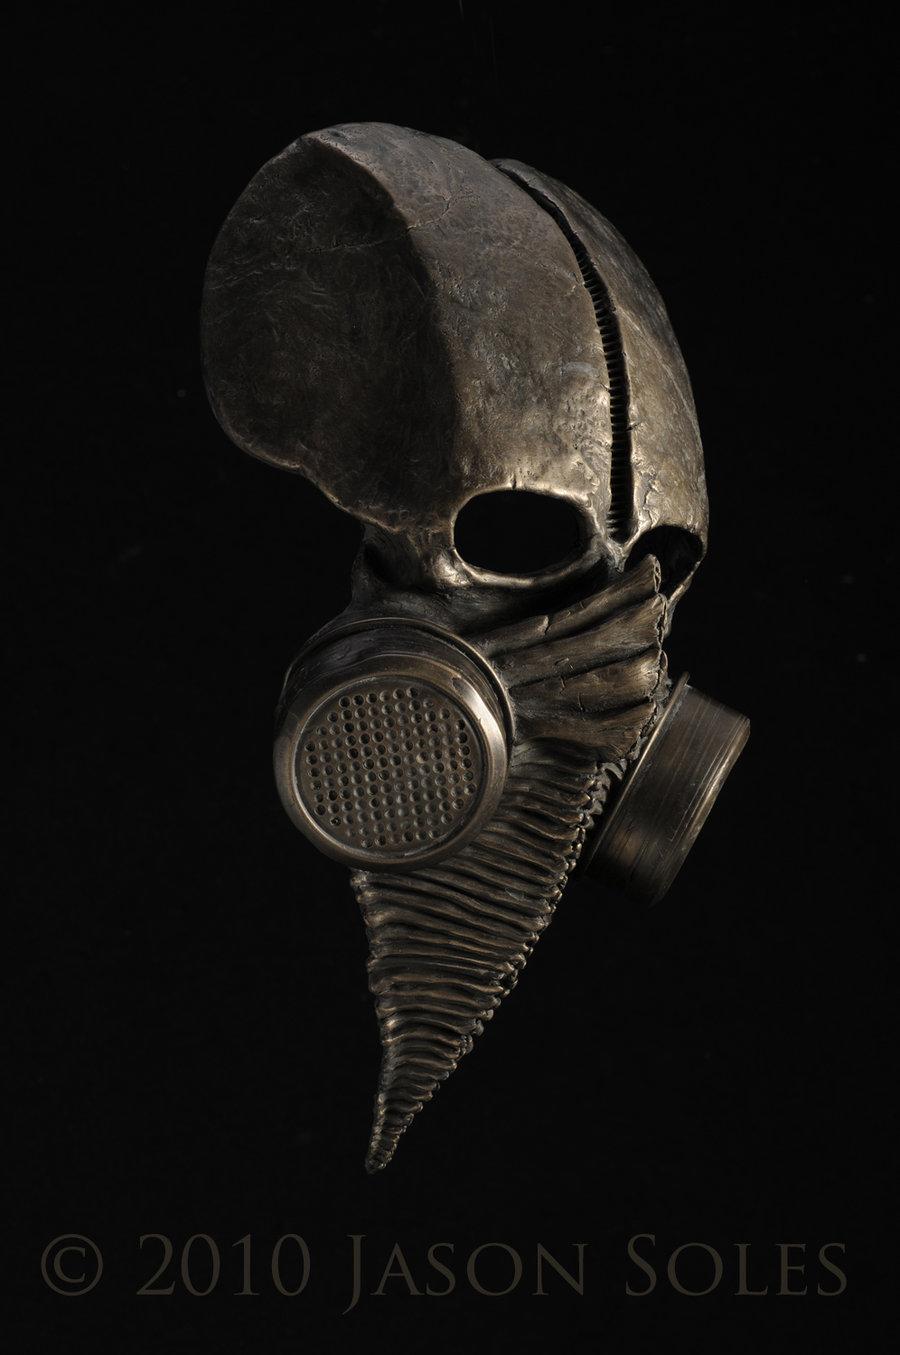 The Masks of Jason Sol...